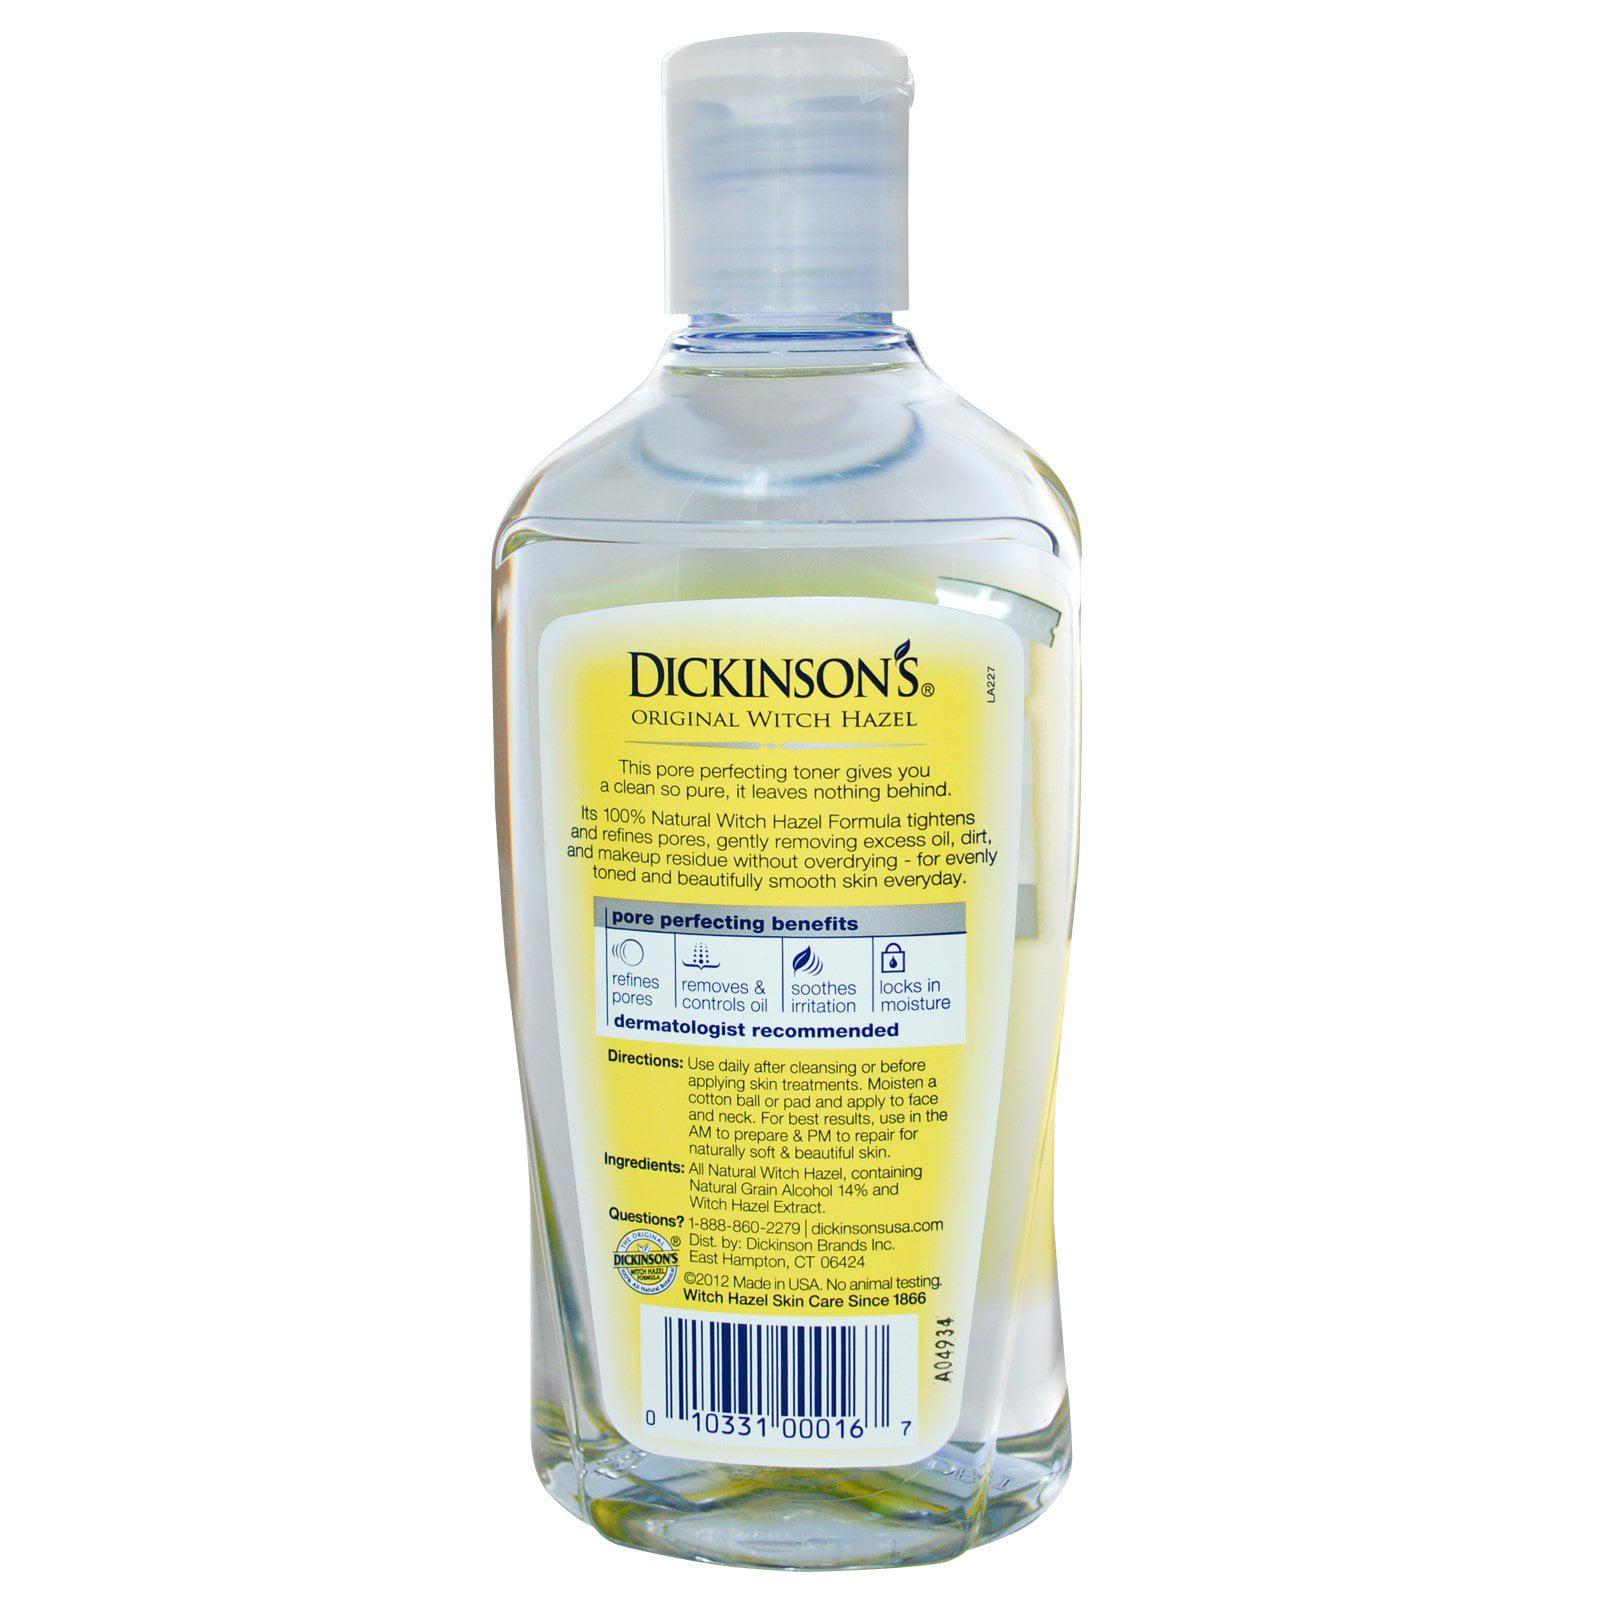 Dickinsons Witch Hazel Pore Perfecting Toner, 8 oz iS Clinical White Lightening Serum 0.5 fl oz / 15 ml